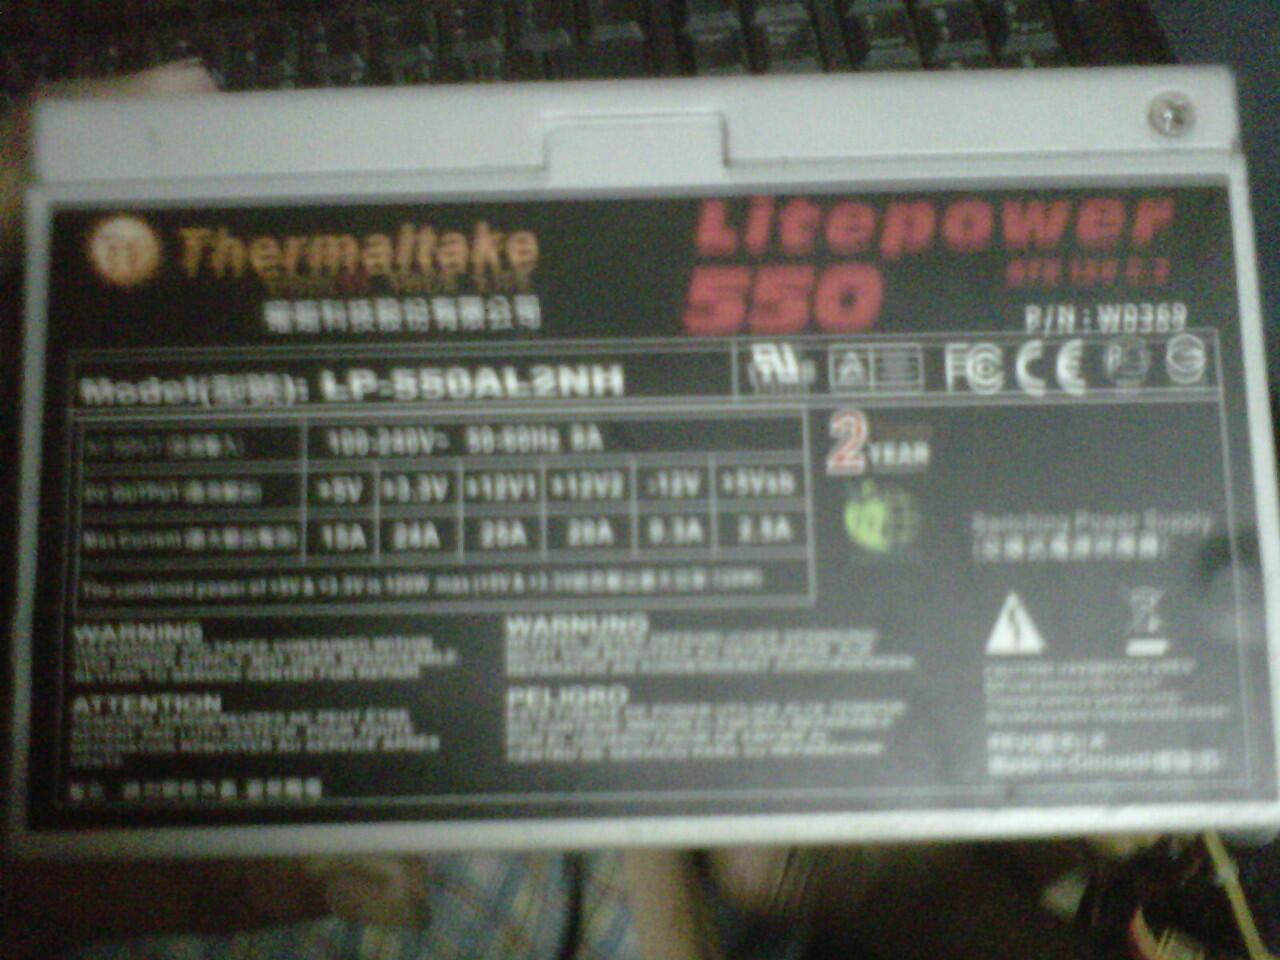 THERMALTAKE LITEPOWER 550WATT LIKE NEWW